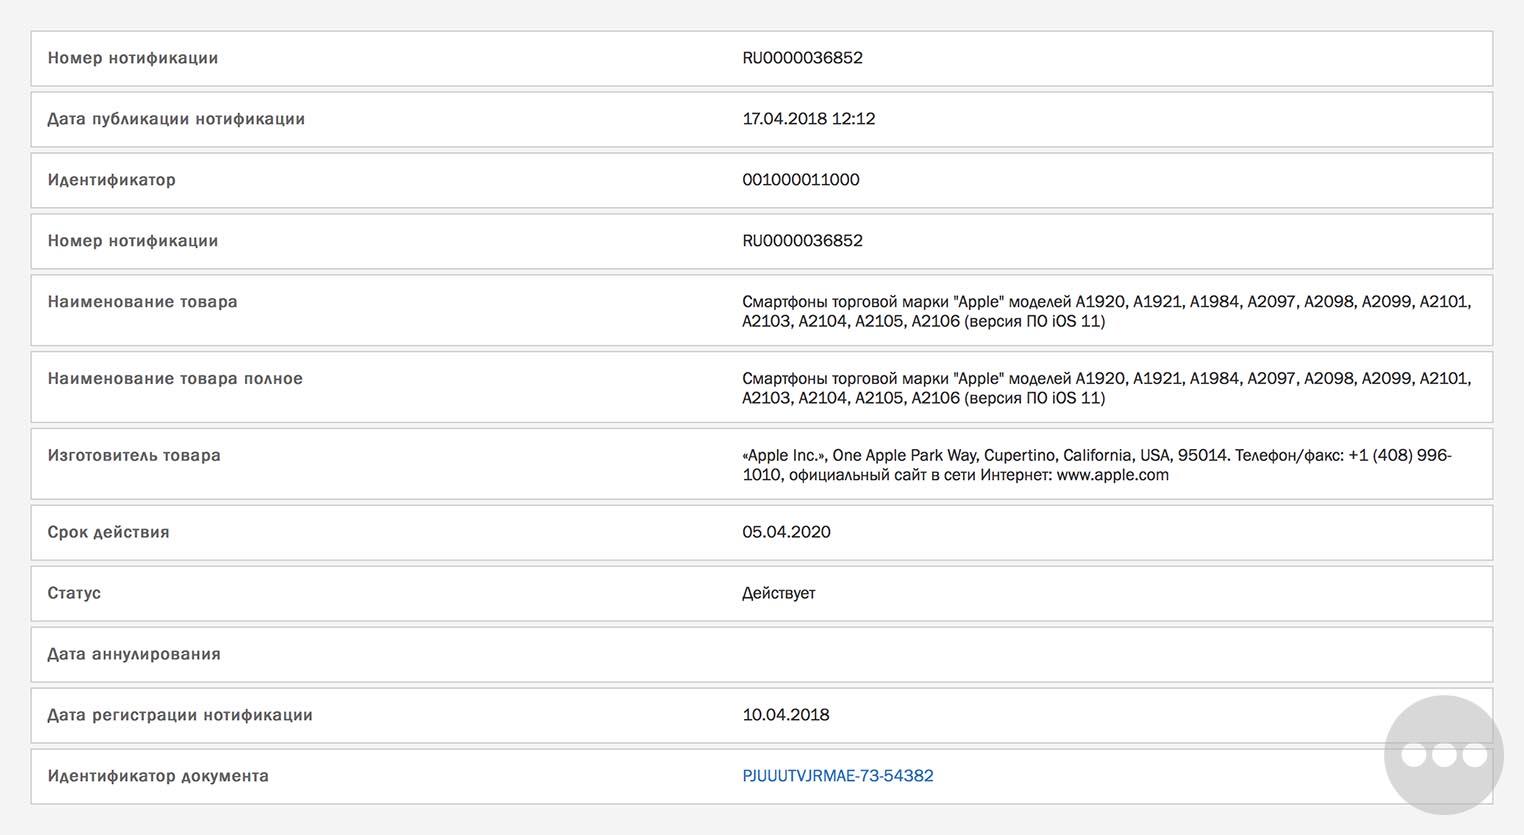 Apple Registers Several New iPhone Models in Eurasia